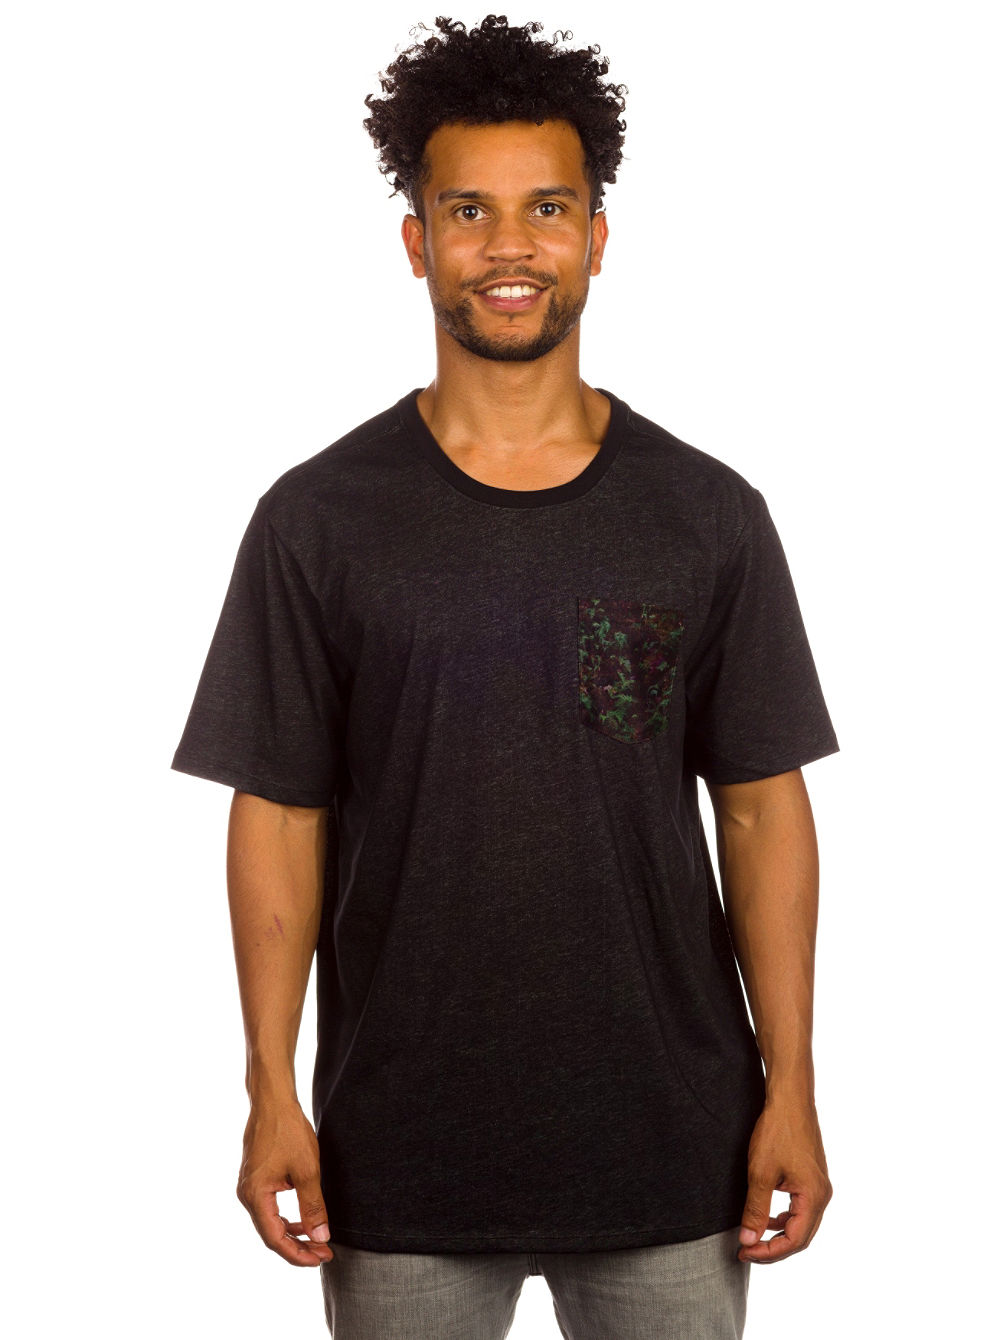 Nike SB DF Fern Pocket T-Shirt - nike - blue-tomato.com